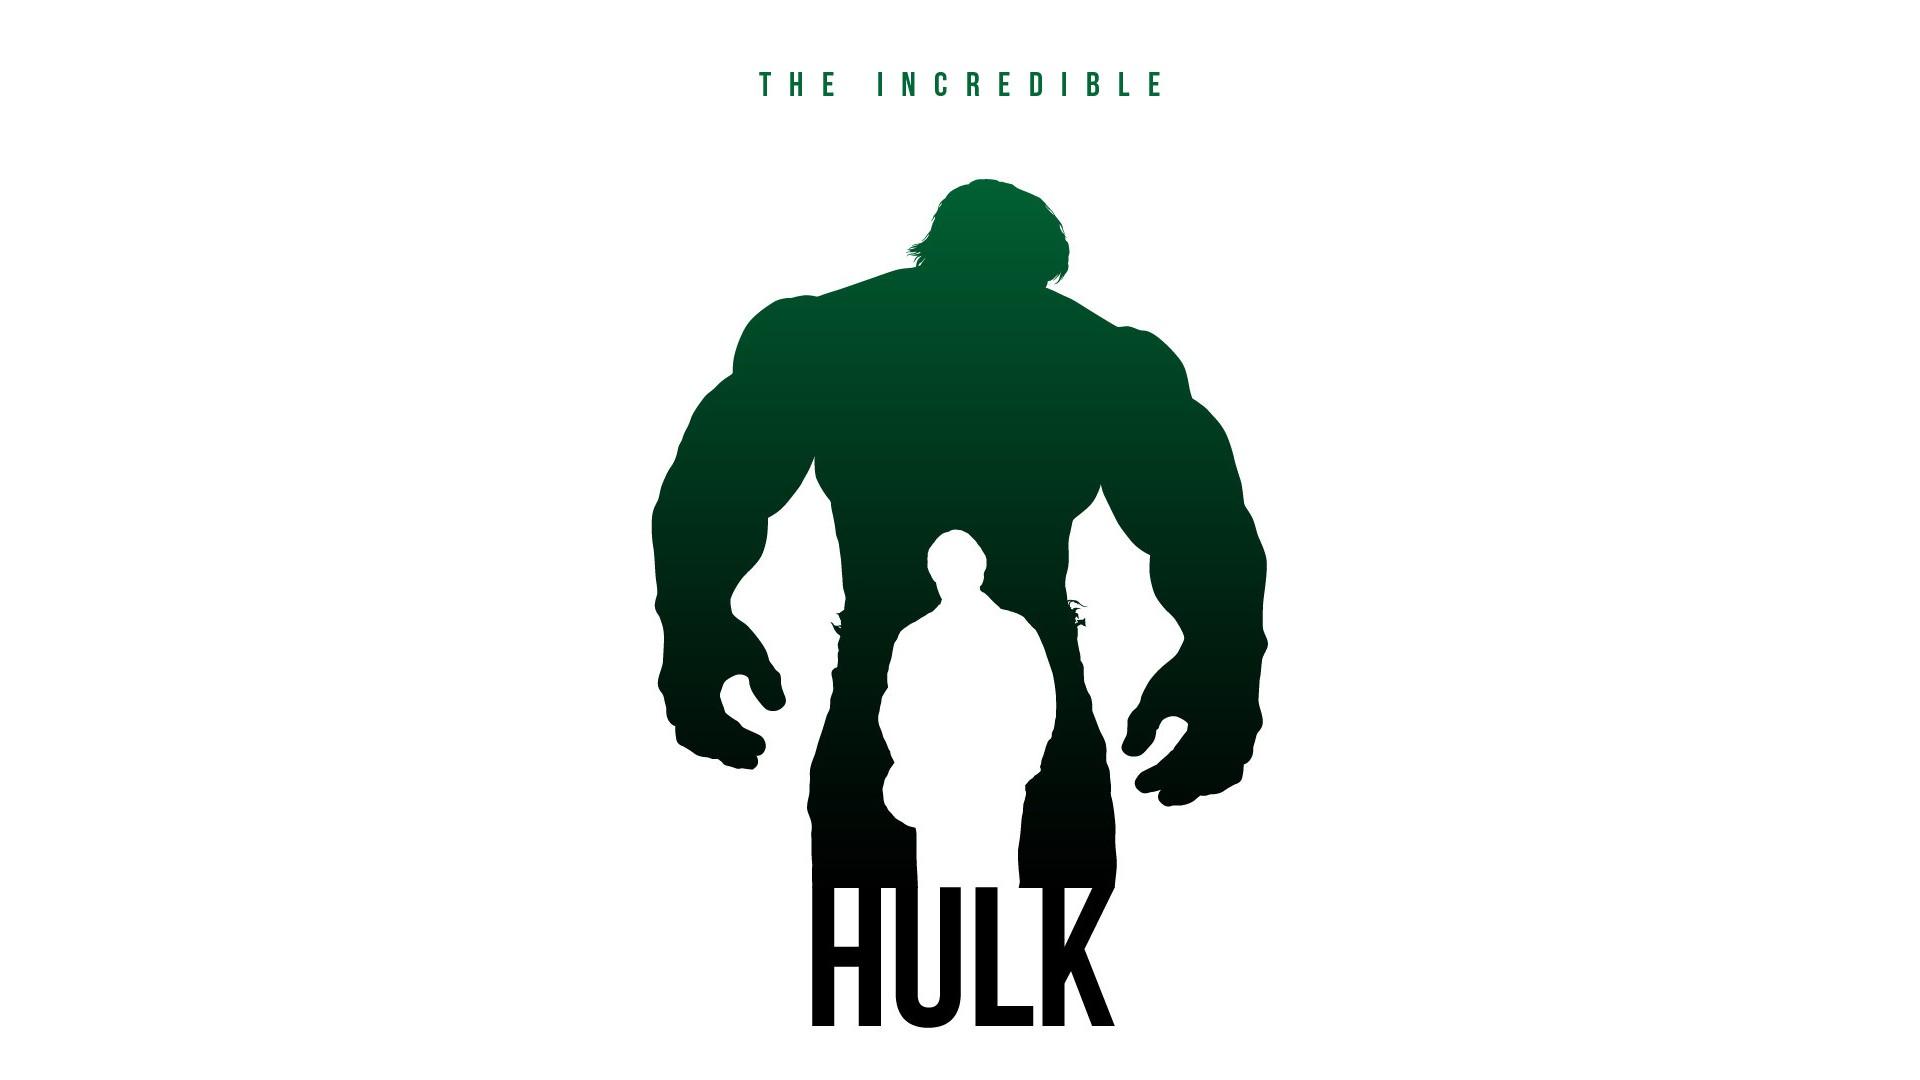 220 hulk hd wallpapers backgrounds wallpaper abyss - Incredible hulk wallpaper avengers ...